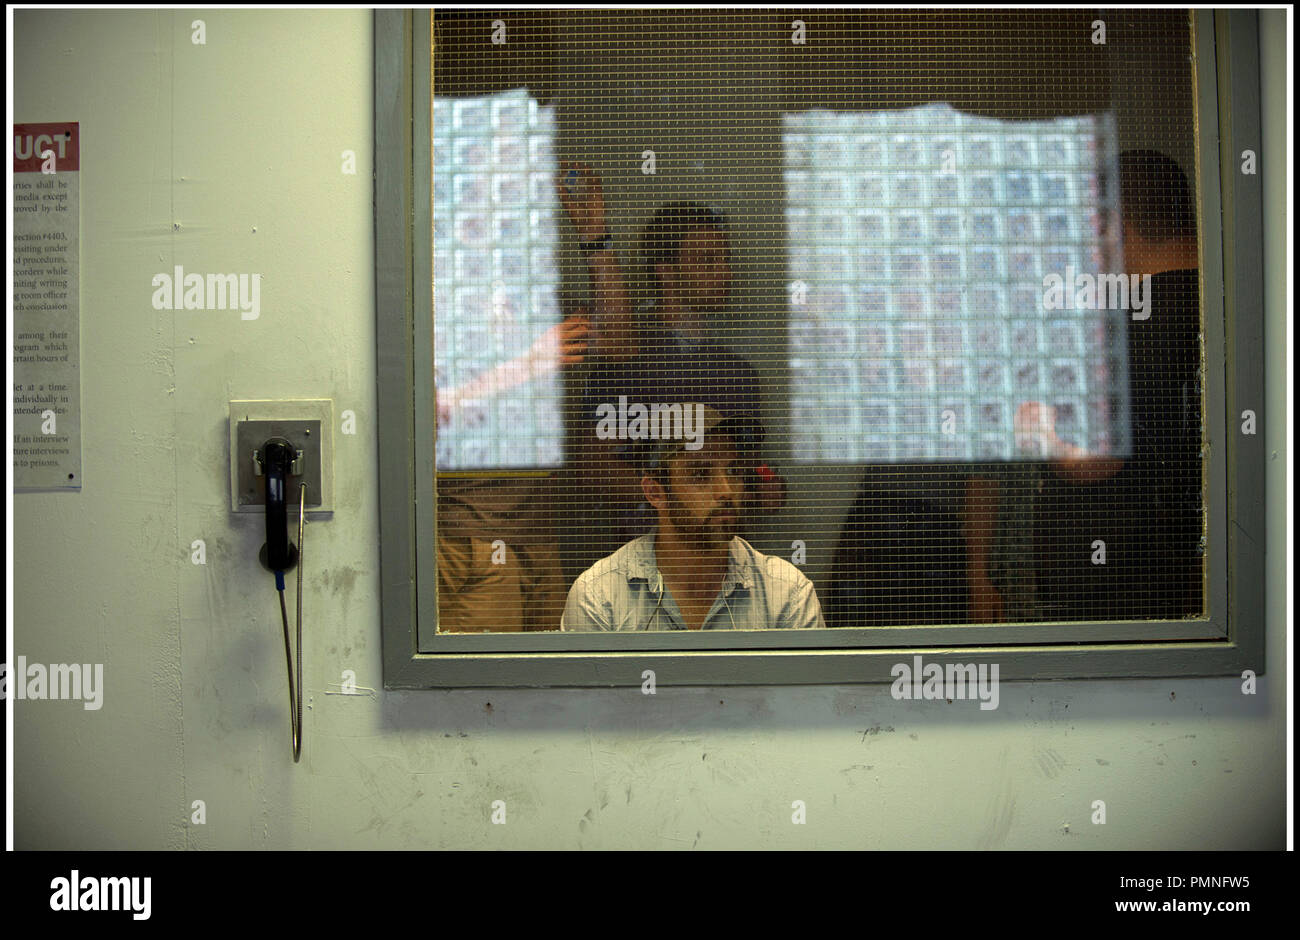 Prod DB © RabbitBandini Productions - Windowseat Entertainment / DR BEYOND LIES (THE ADDERALL DIARIES) de Pamela Romanowsky 2015 USA tournage - Stock Image